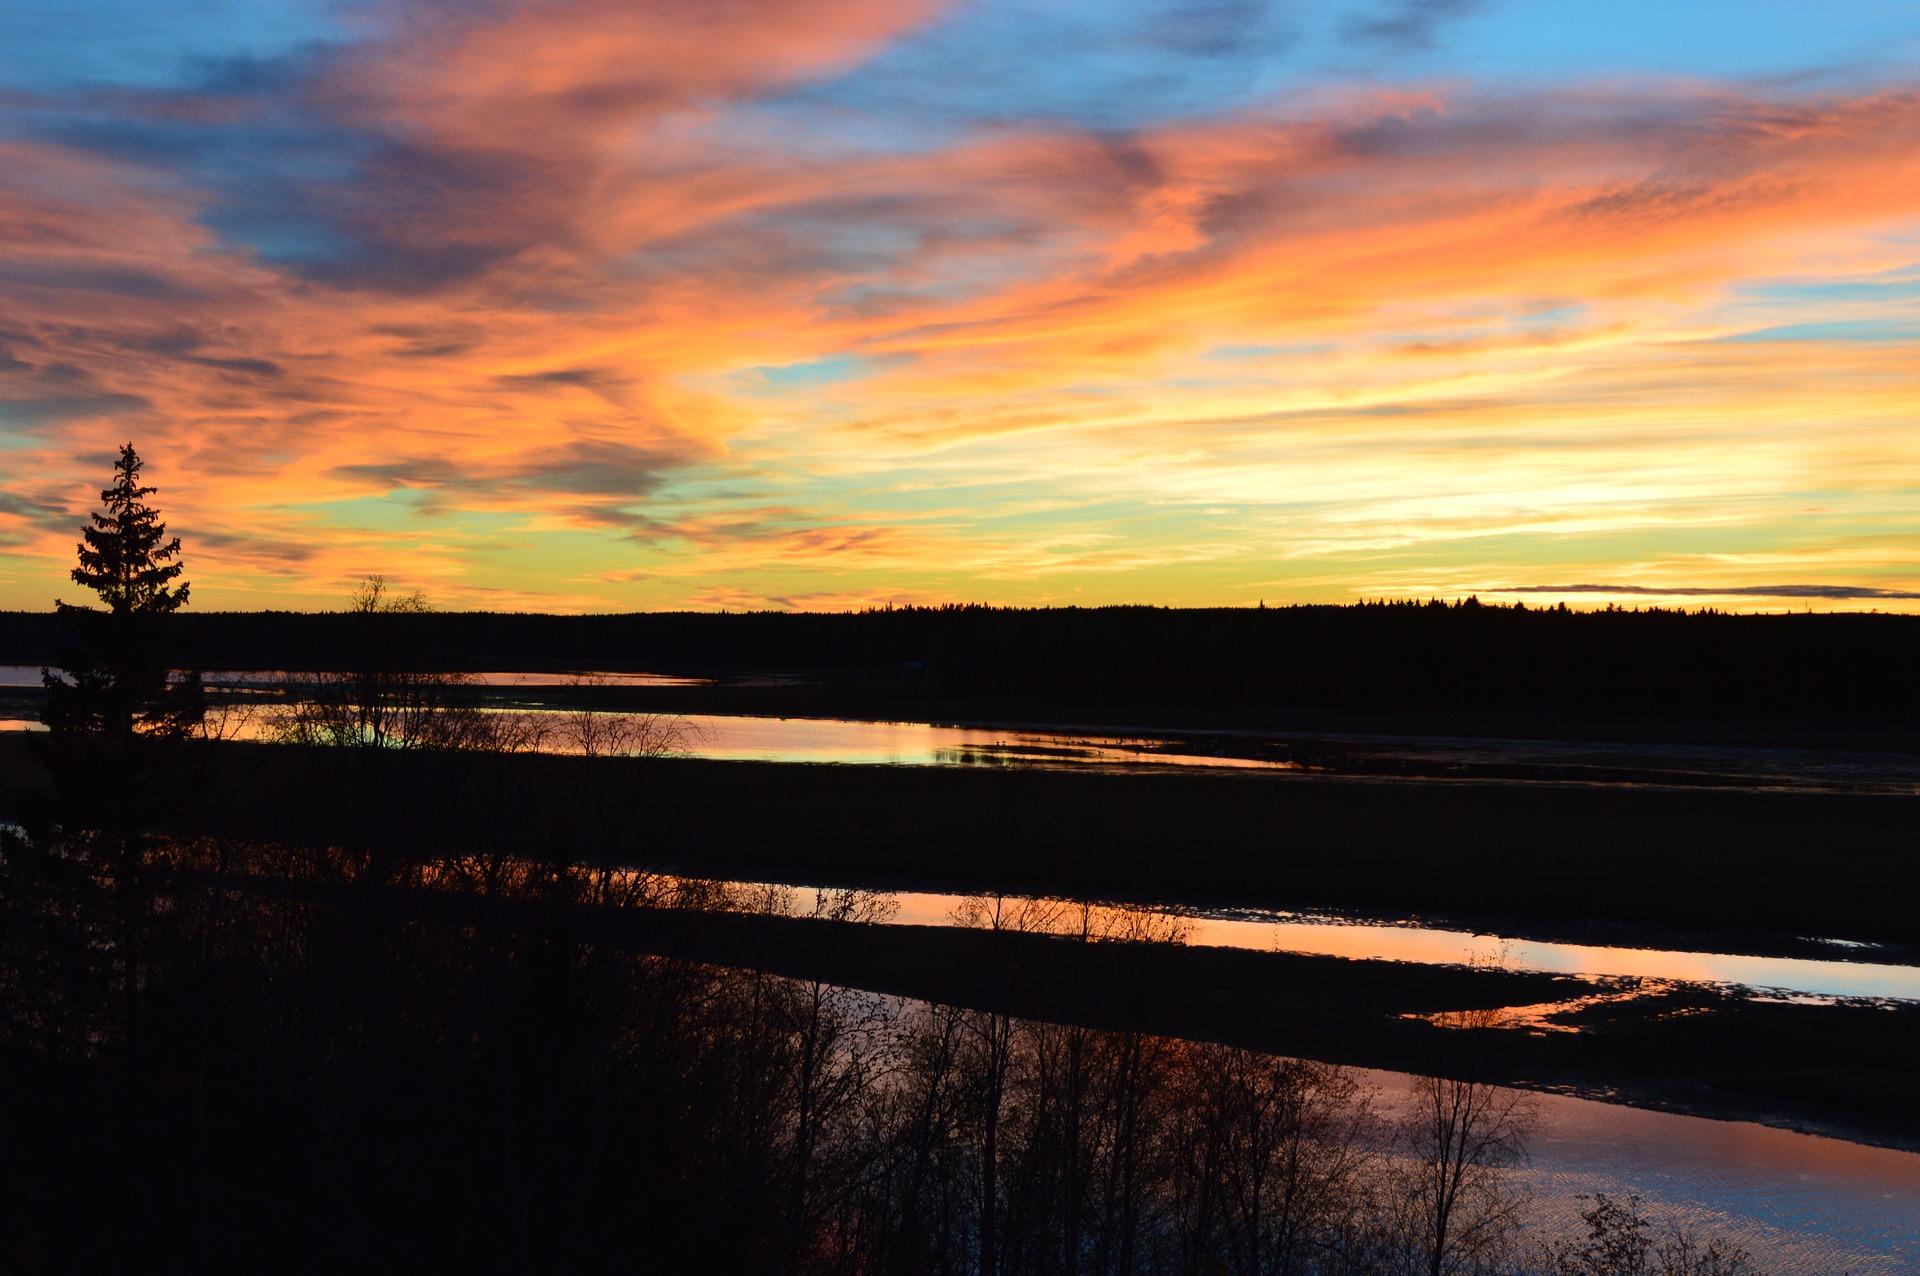 sunset-1021083_1920